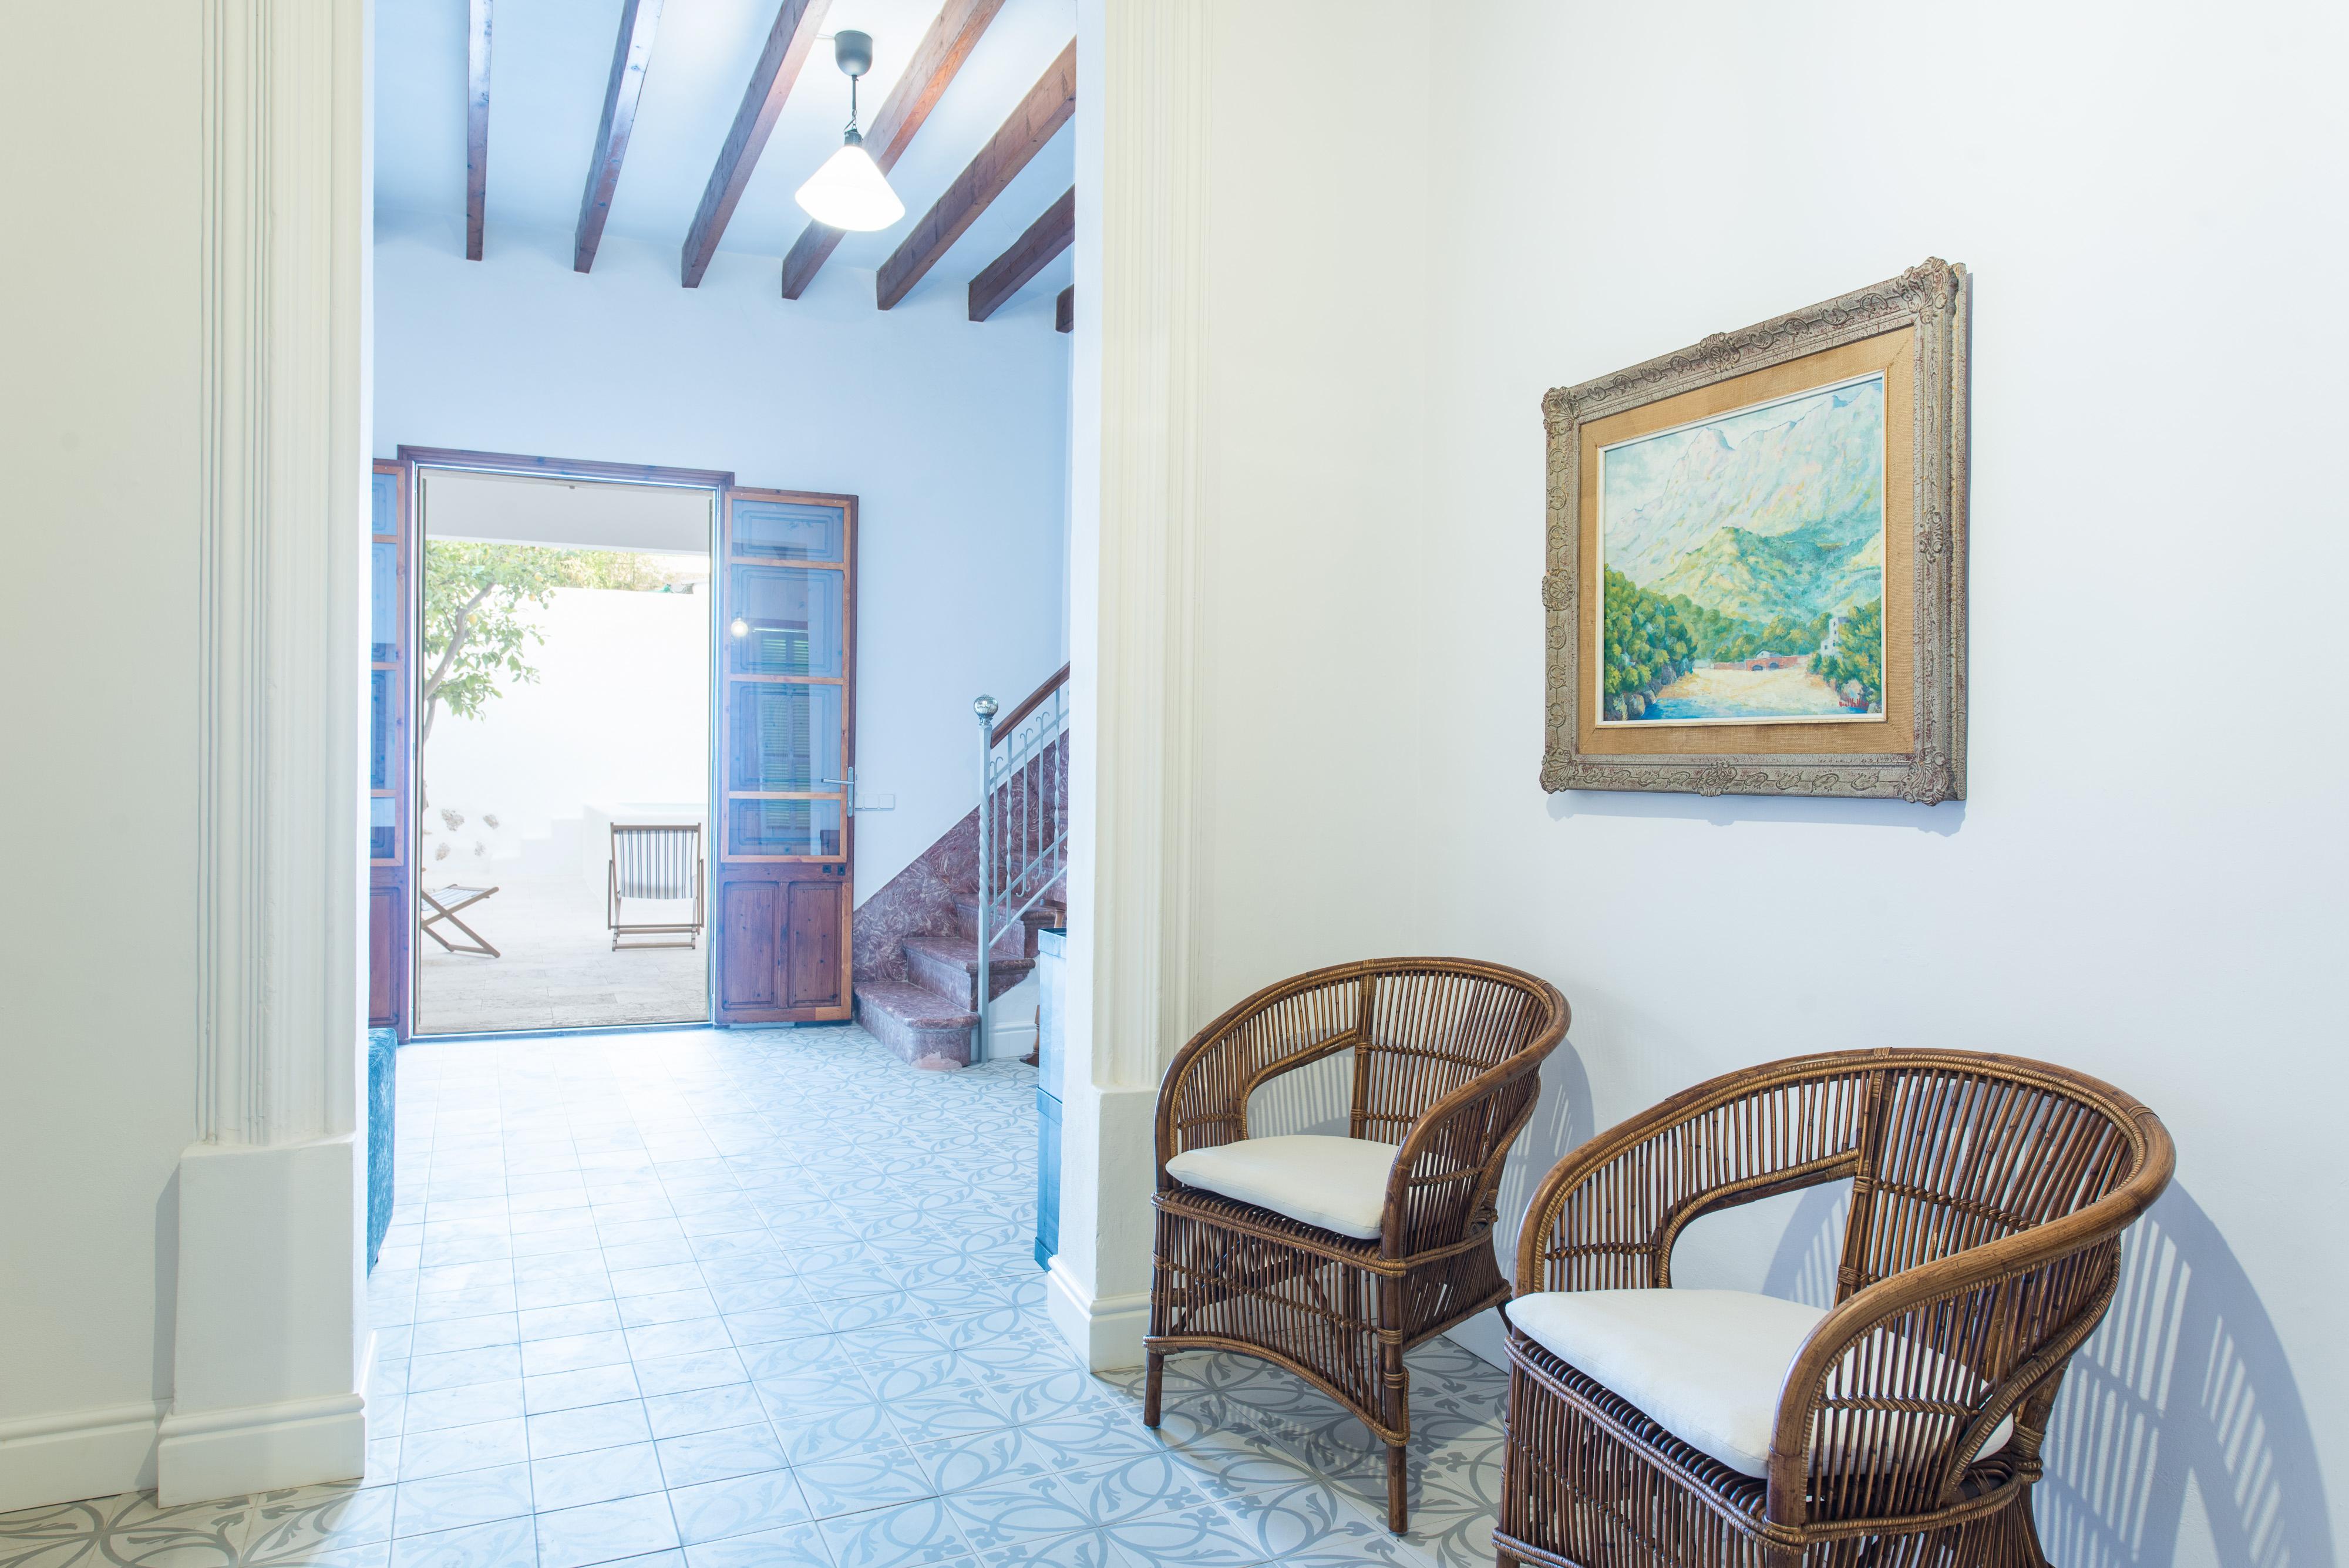 Maison de vacances CA NA MANDOLA (1956247), Alaro, Majorque, Iles Baléares, Espagne, image 7